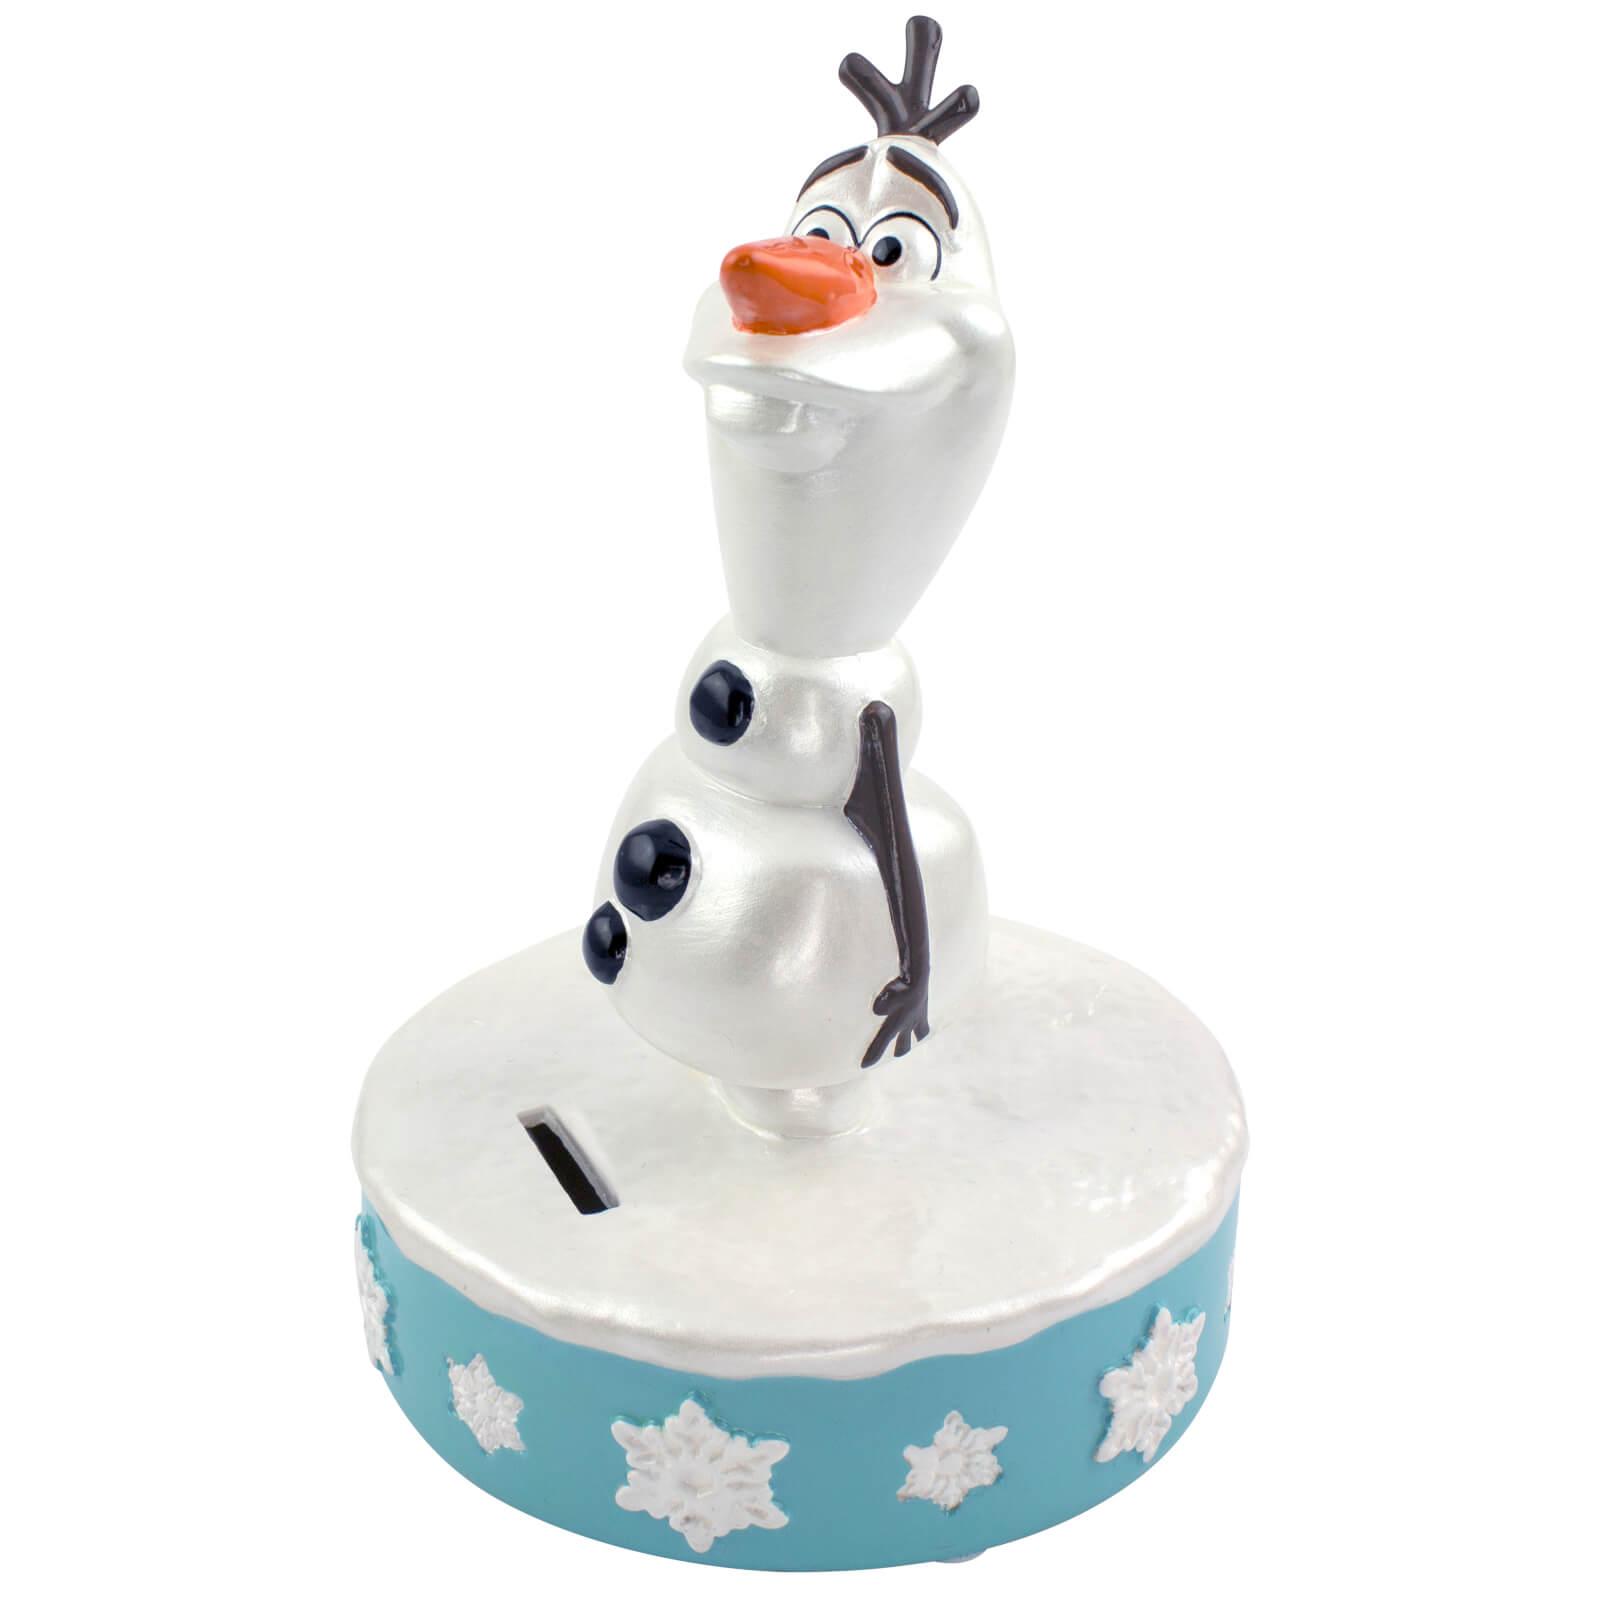 Image of Frozen Olaf Money Box